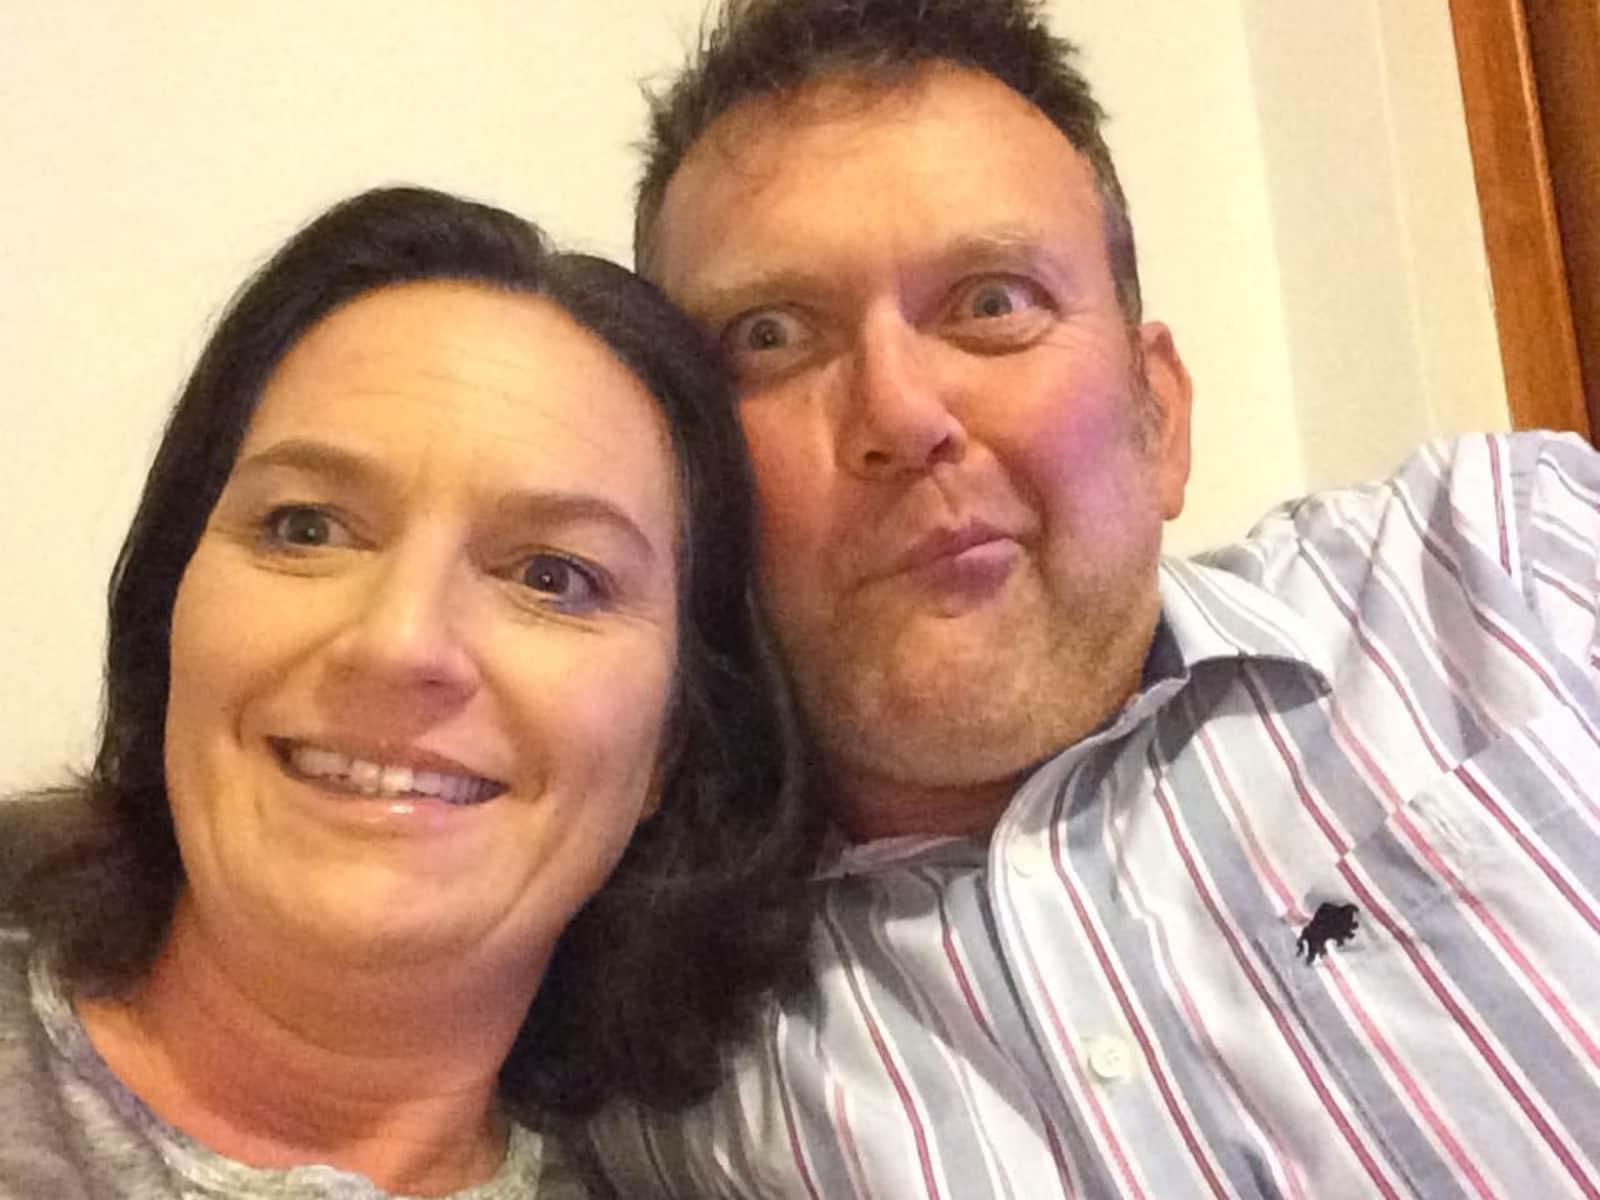 Edwina & Ross from Birmingham, United Kingdom